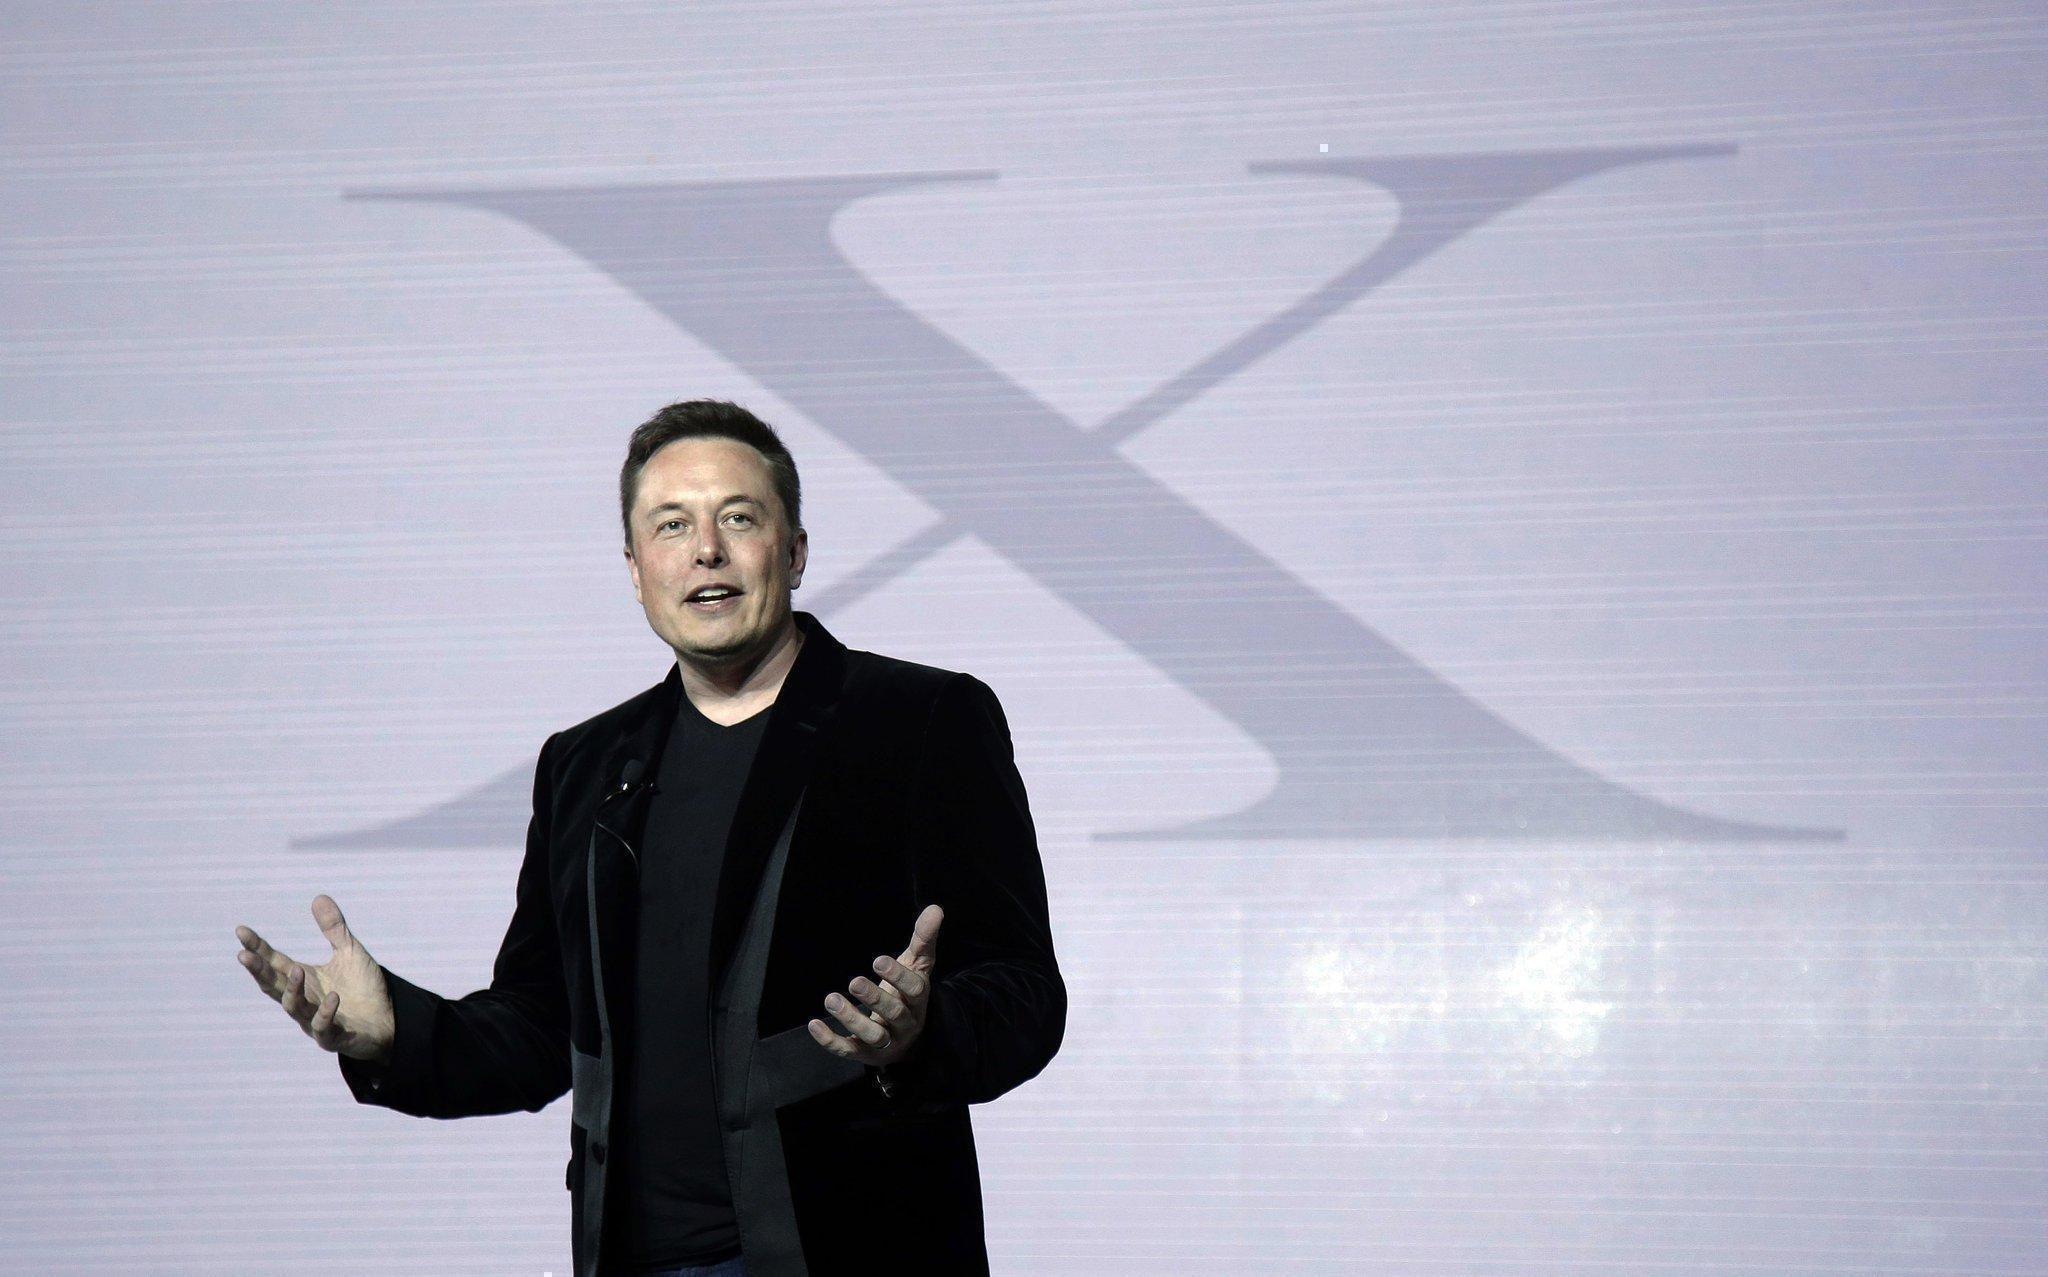 Elon Musk announces plan to revolutionize factories Elon